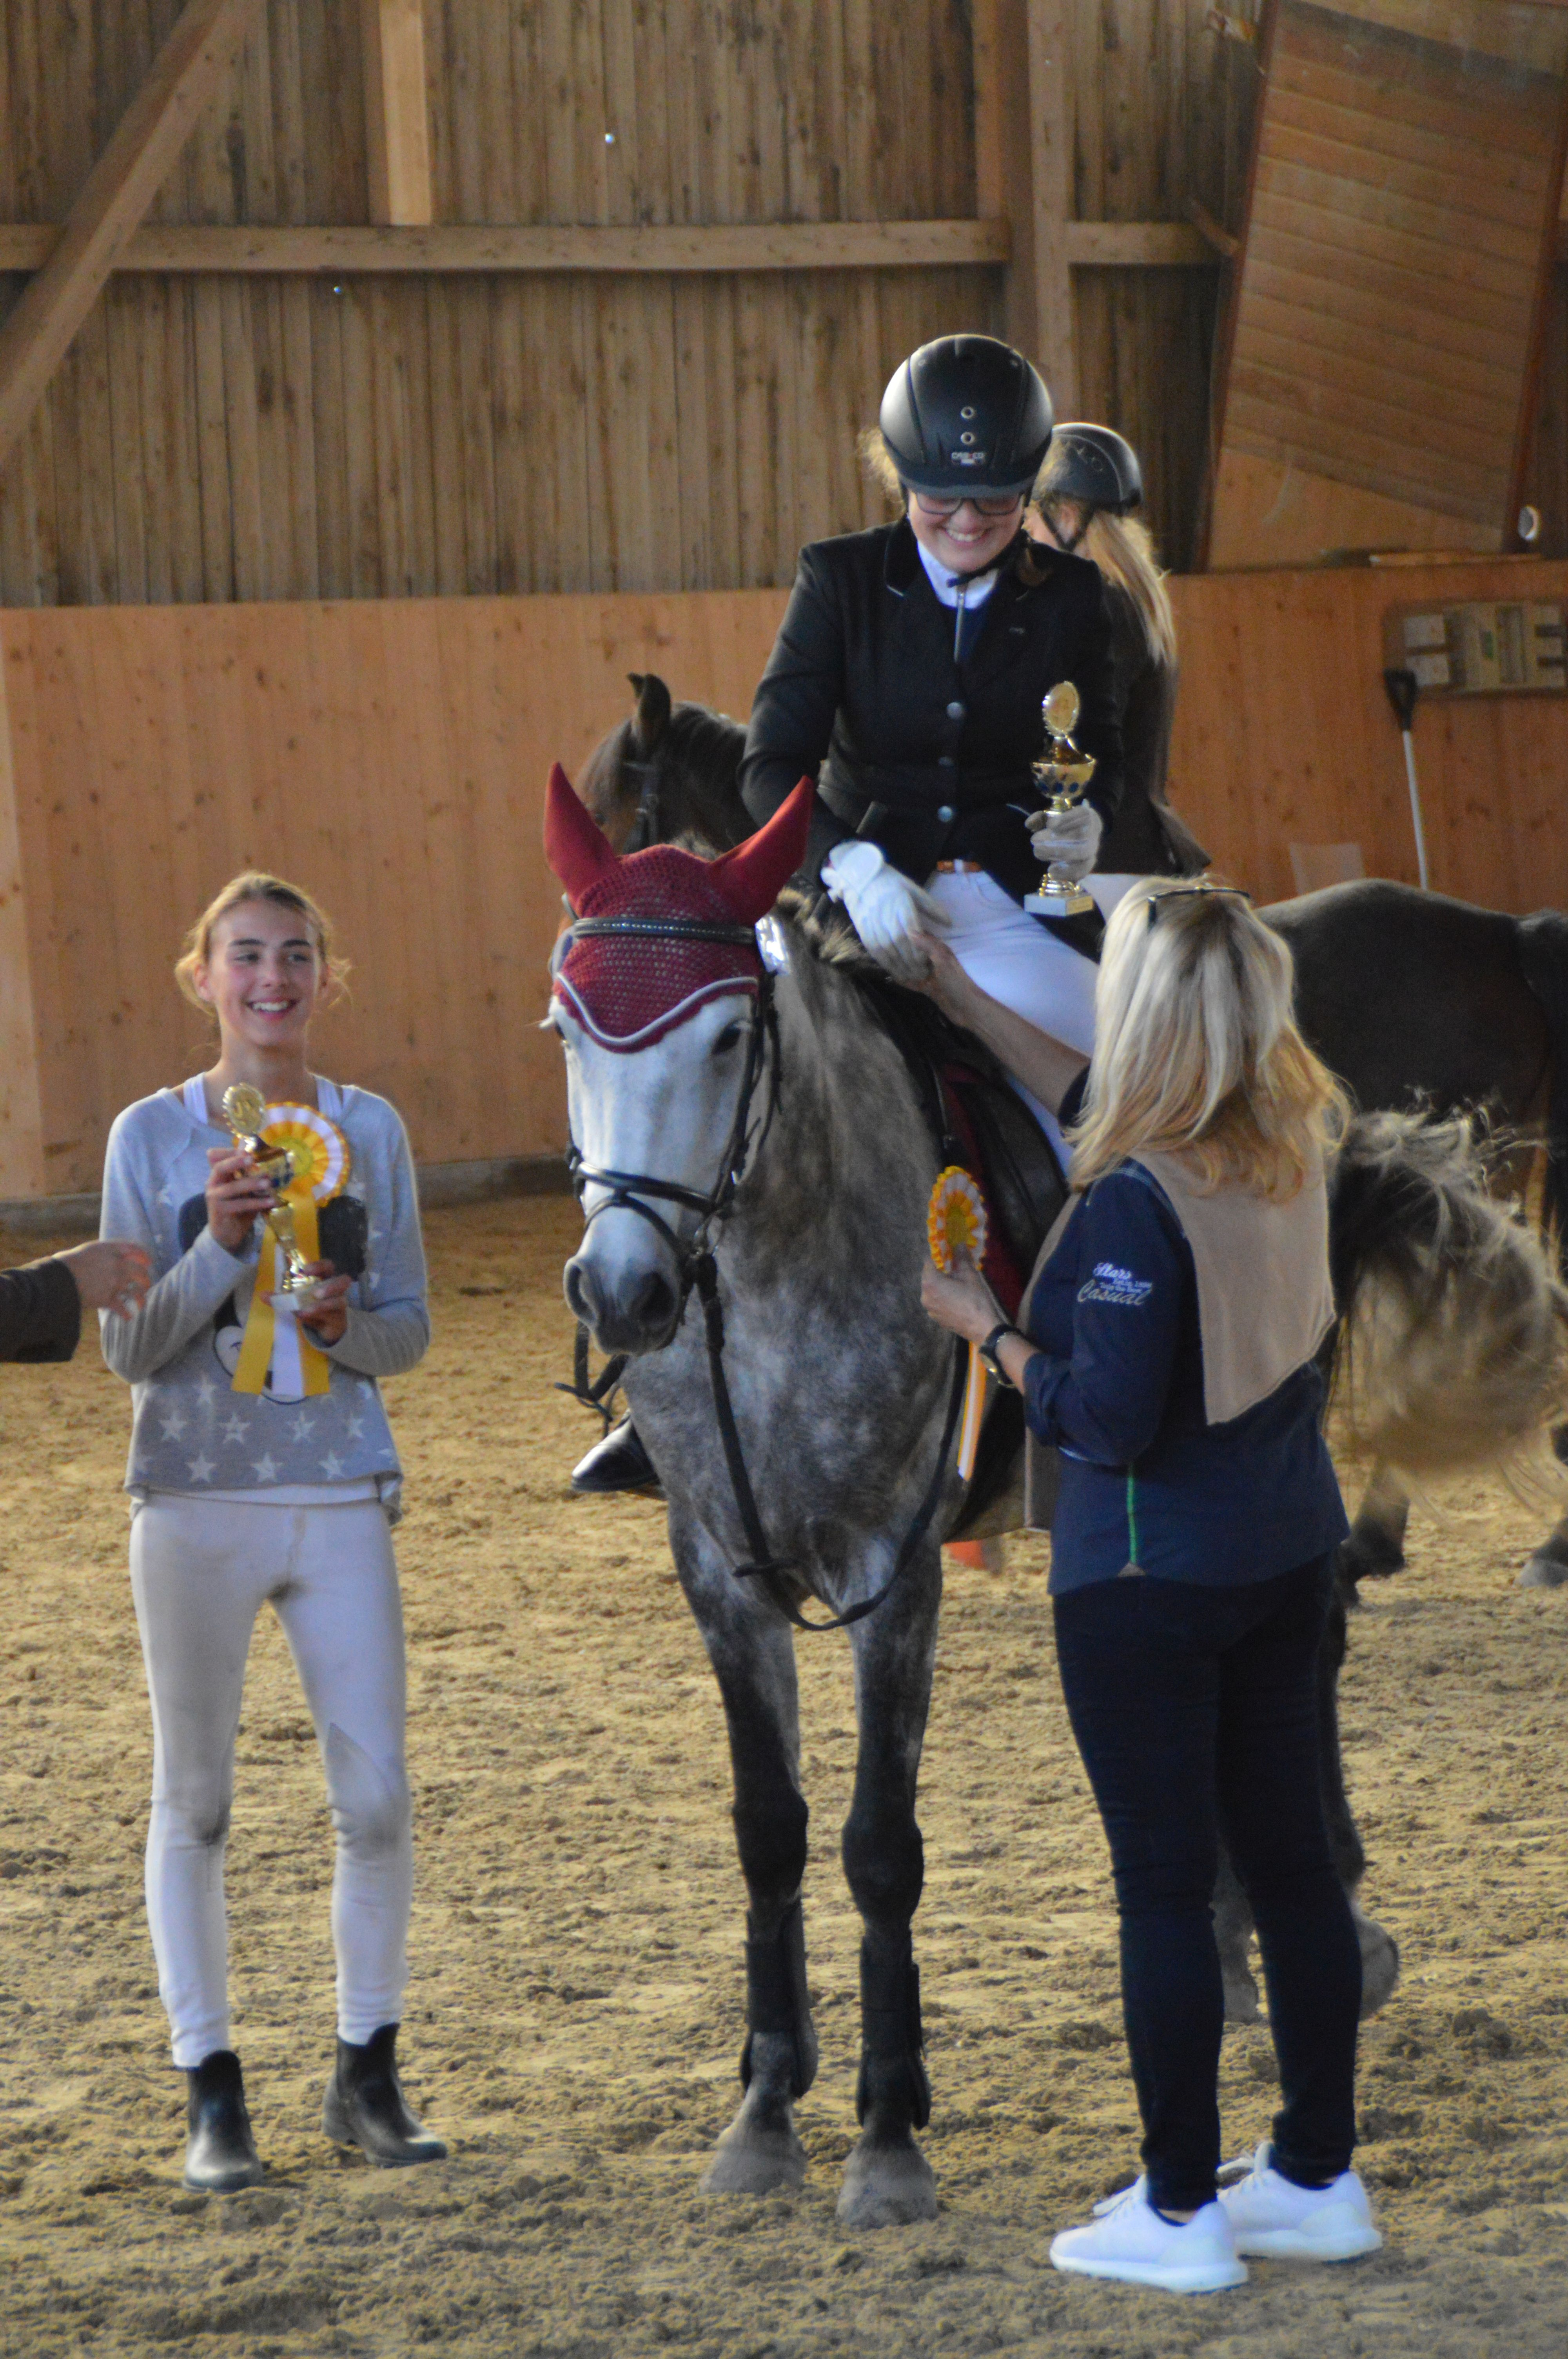 1. Platz Reiterin Gallecker Johanna auf Shalamar Tara Läuferin Breca Nicole